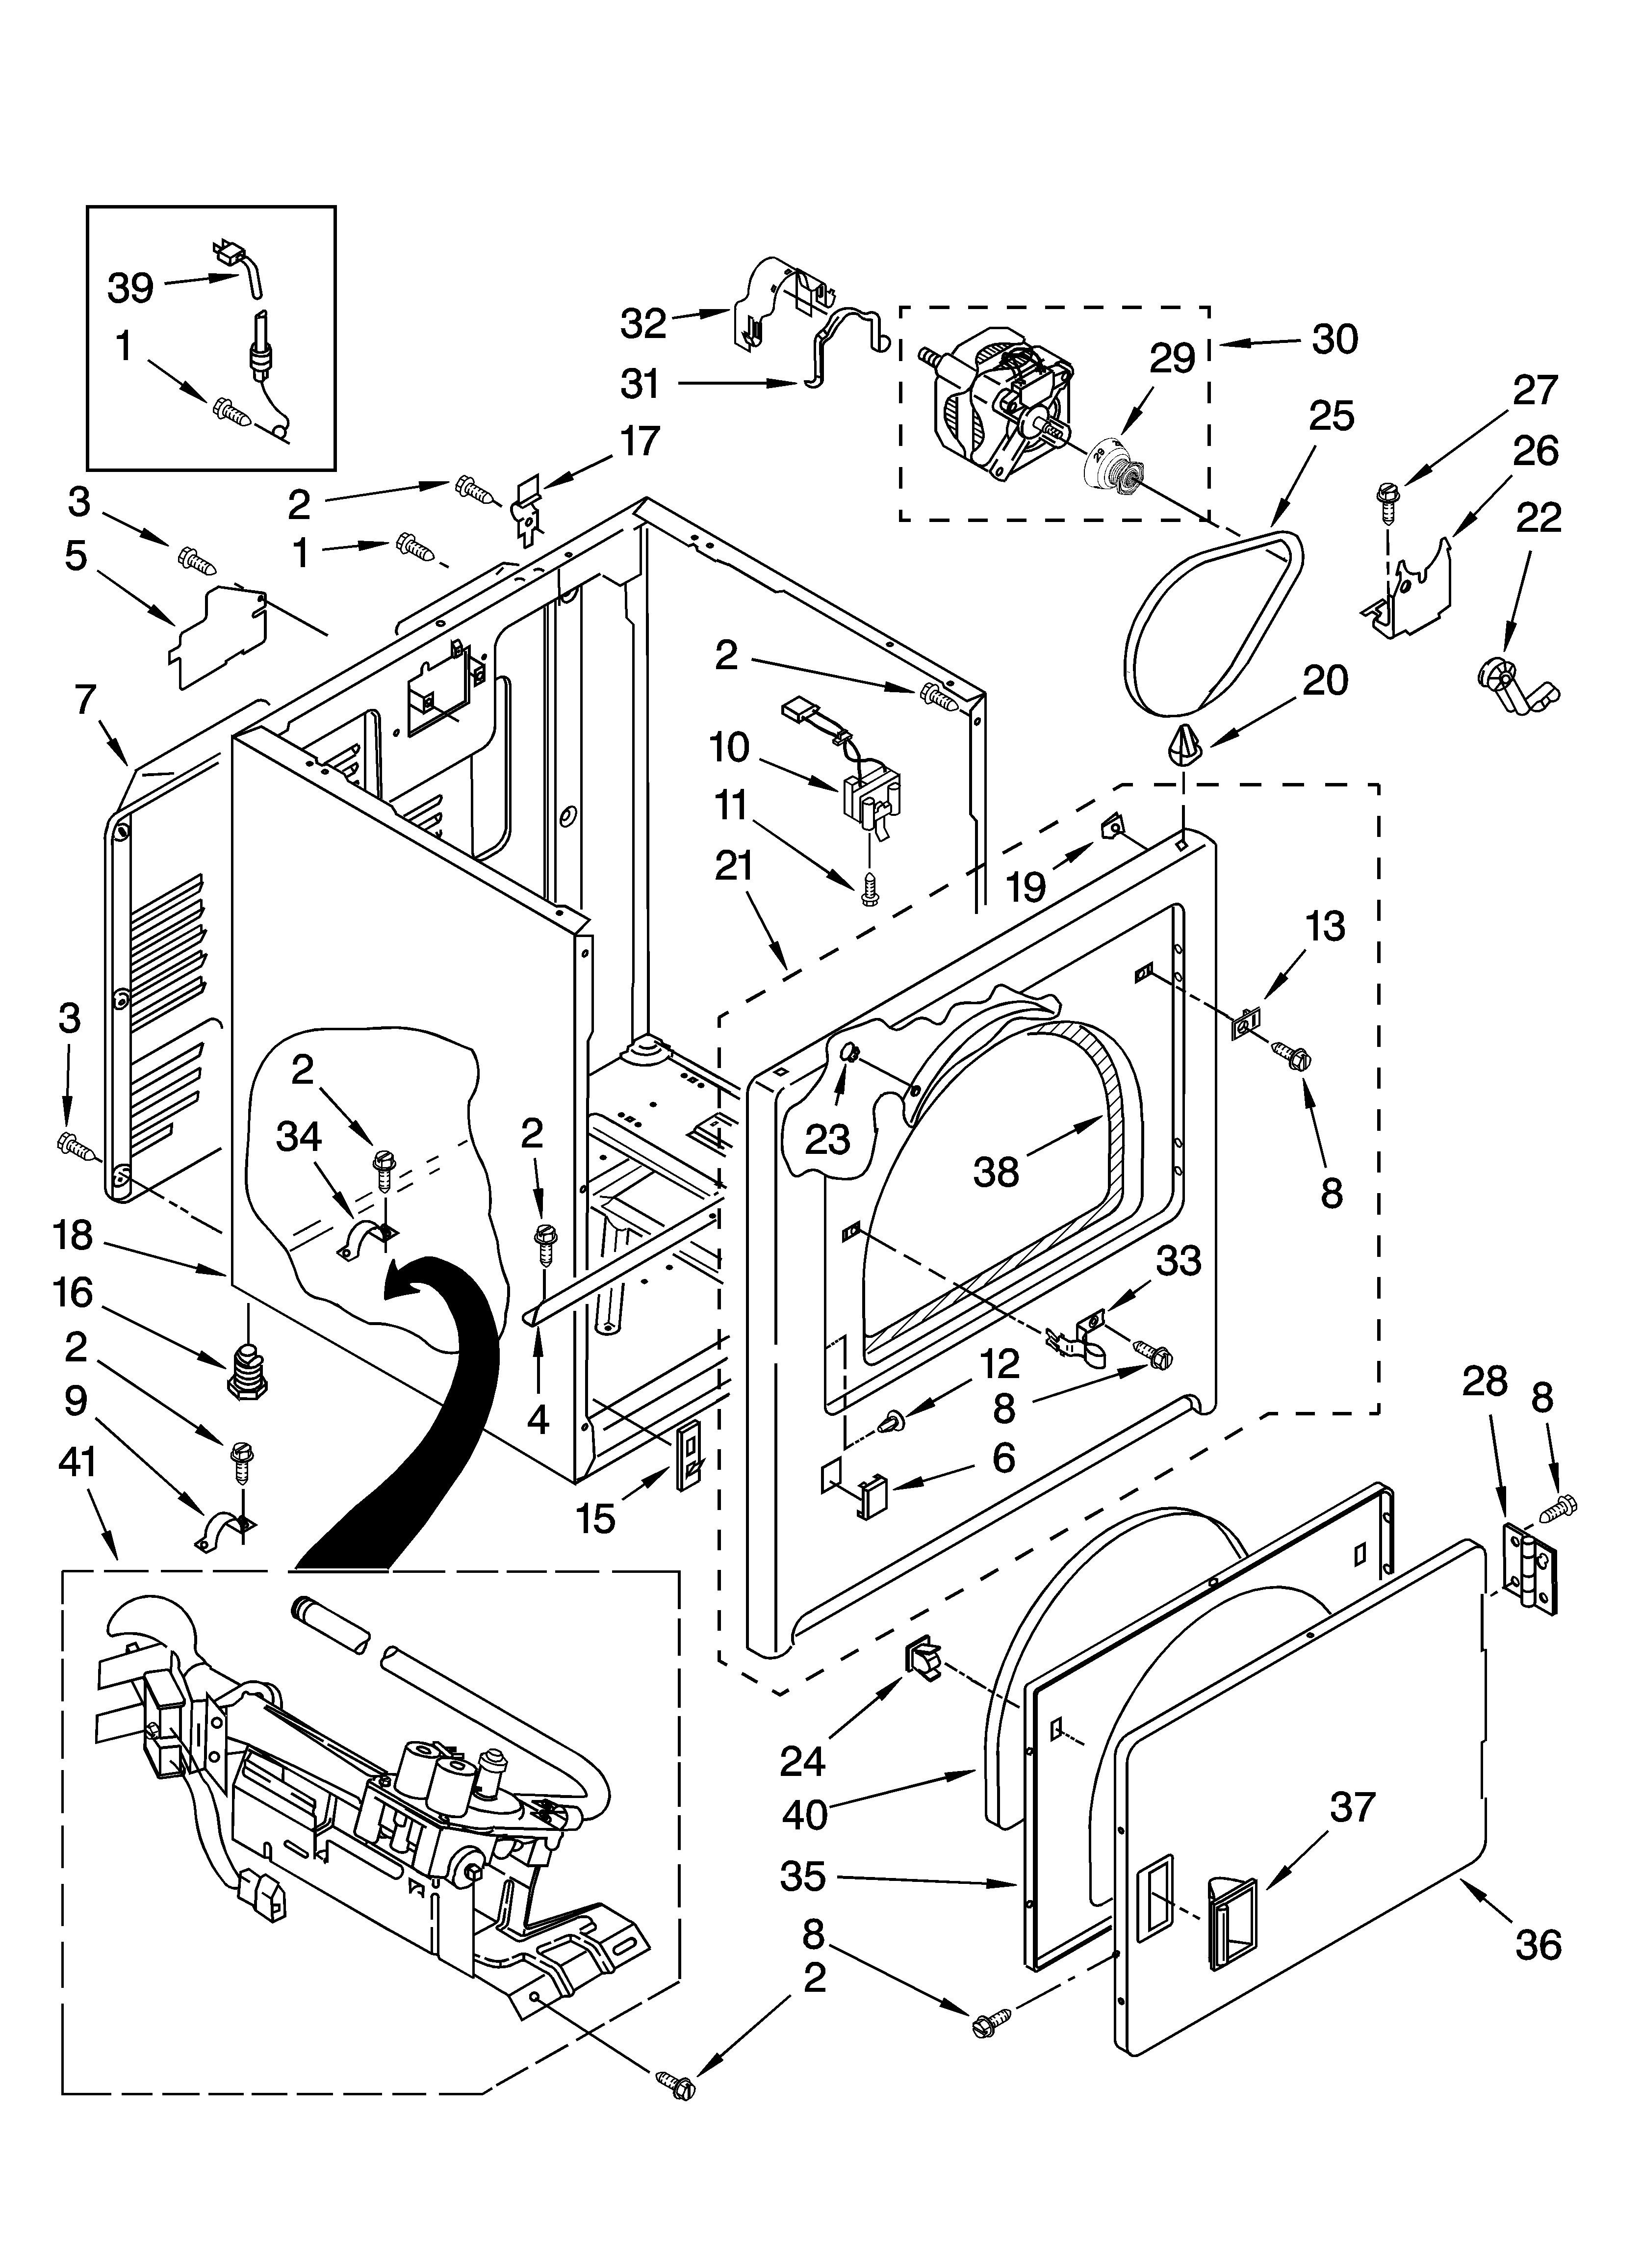 admiral dryer parts diagram admiral model agd4475tq1 residential rh detoxicrecenze com Admiral Dryer Admiral Dryer Model Aed4675yq1